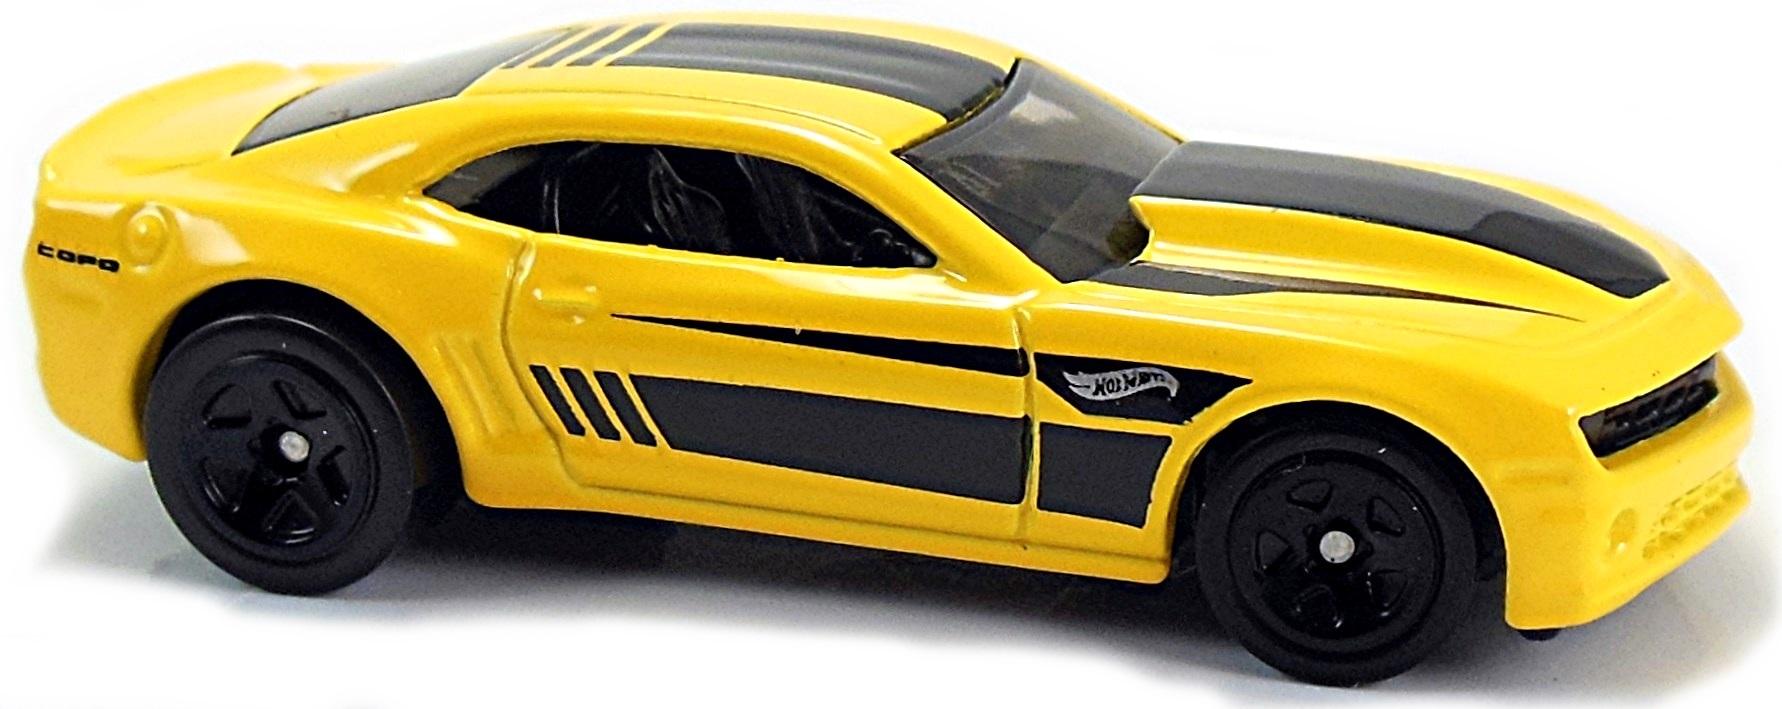 8 13 Copo Camaro Yellow Sp5bk